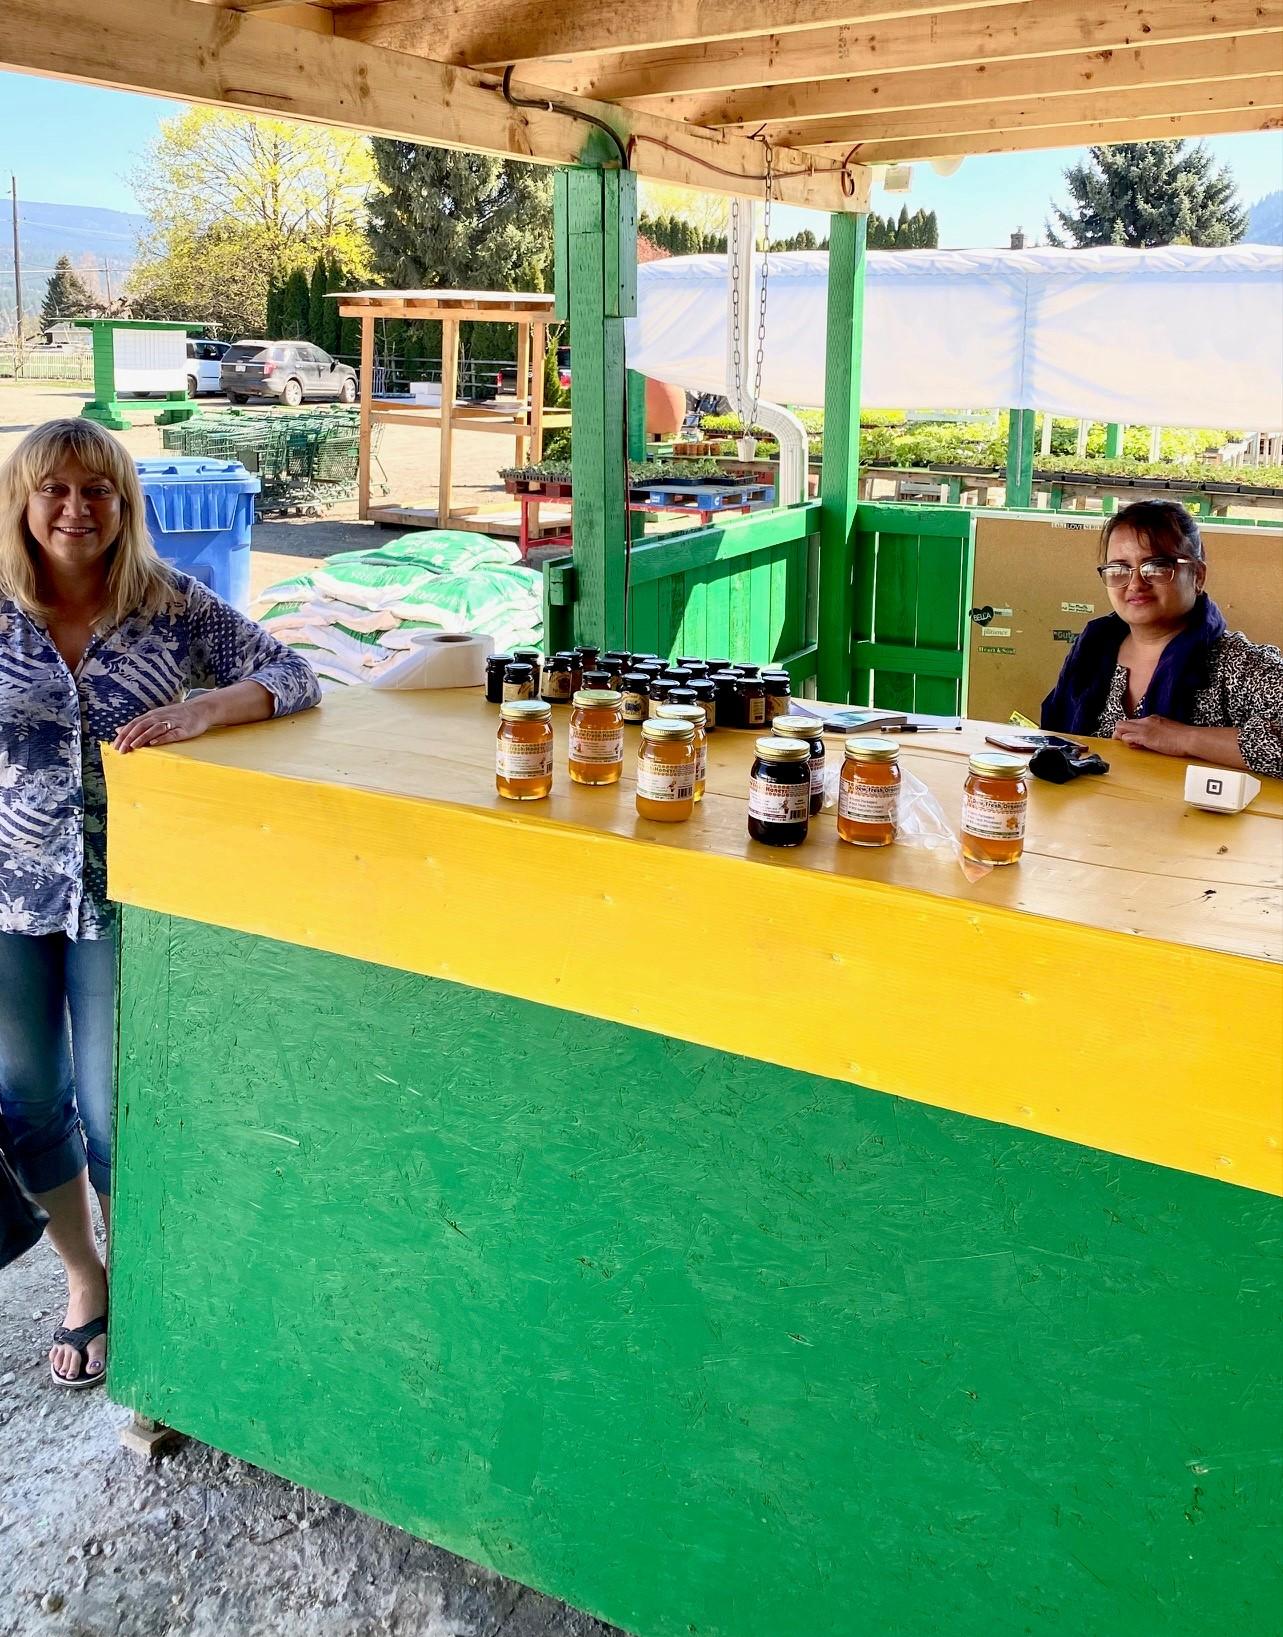 Small Business Spotlight: Shanks Farm Market Green House & Nursery